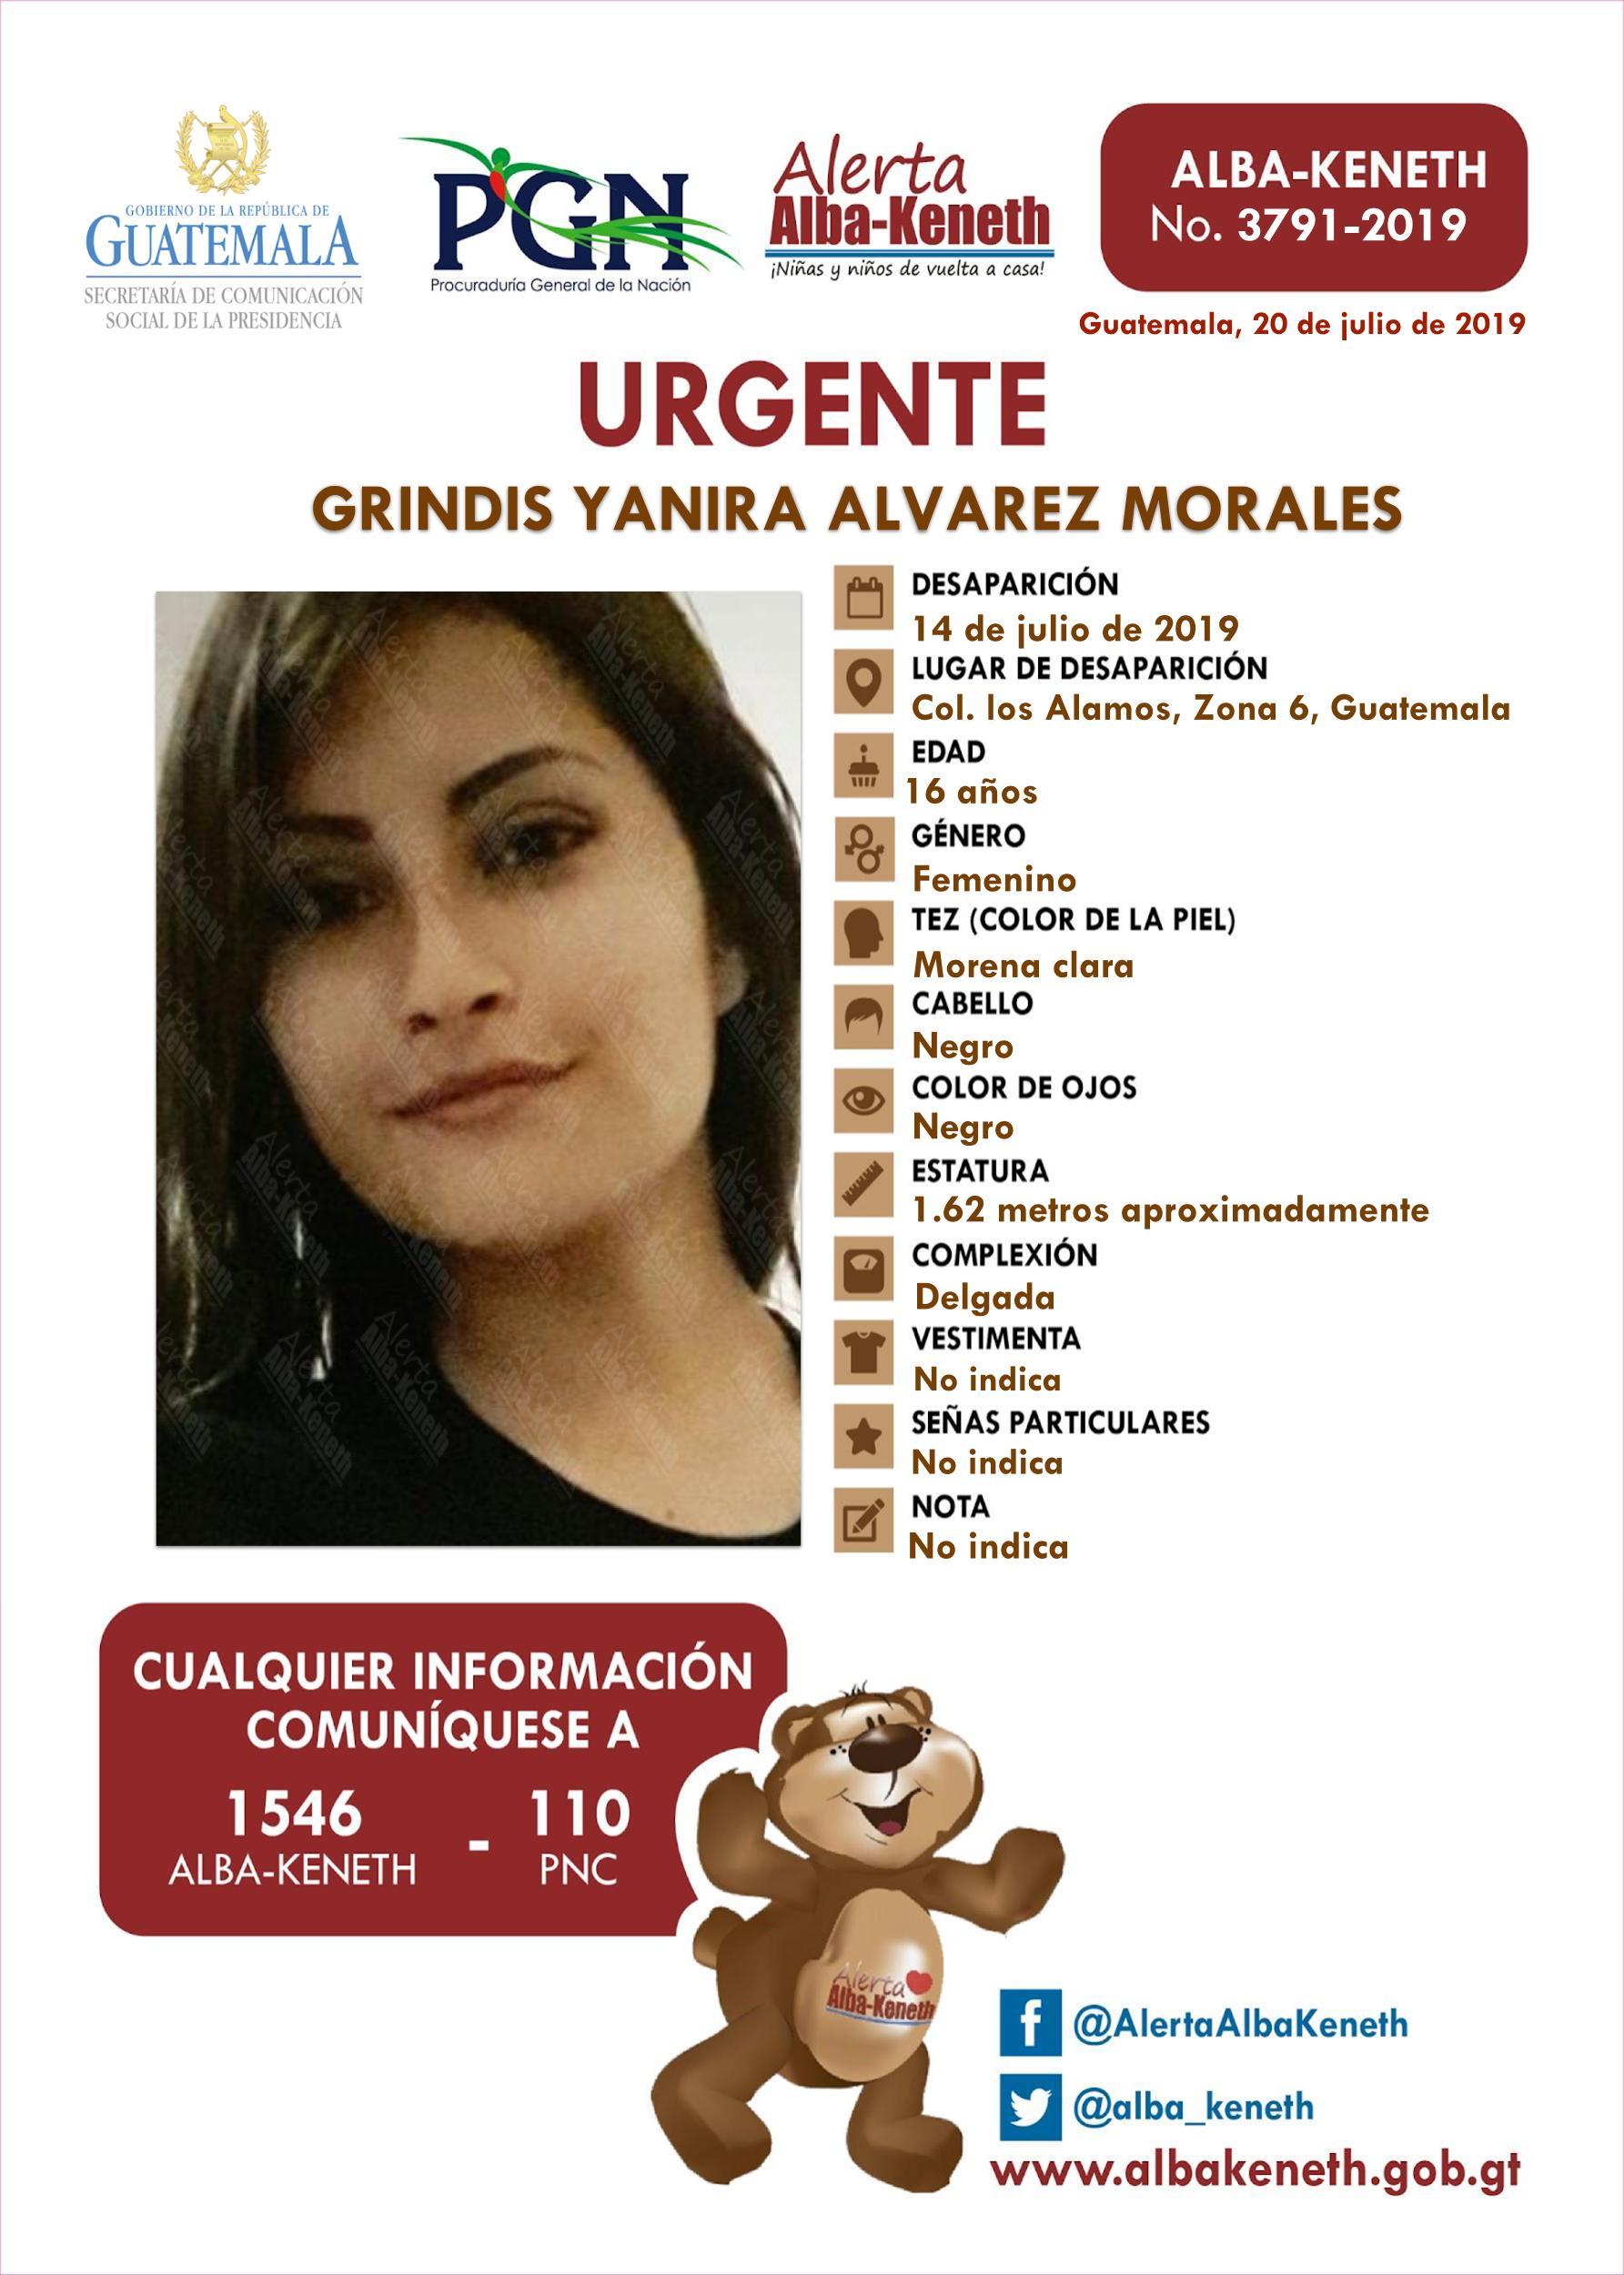 Grindis Yanira Alvarez Morales